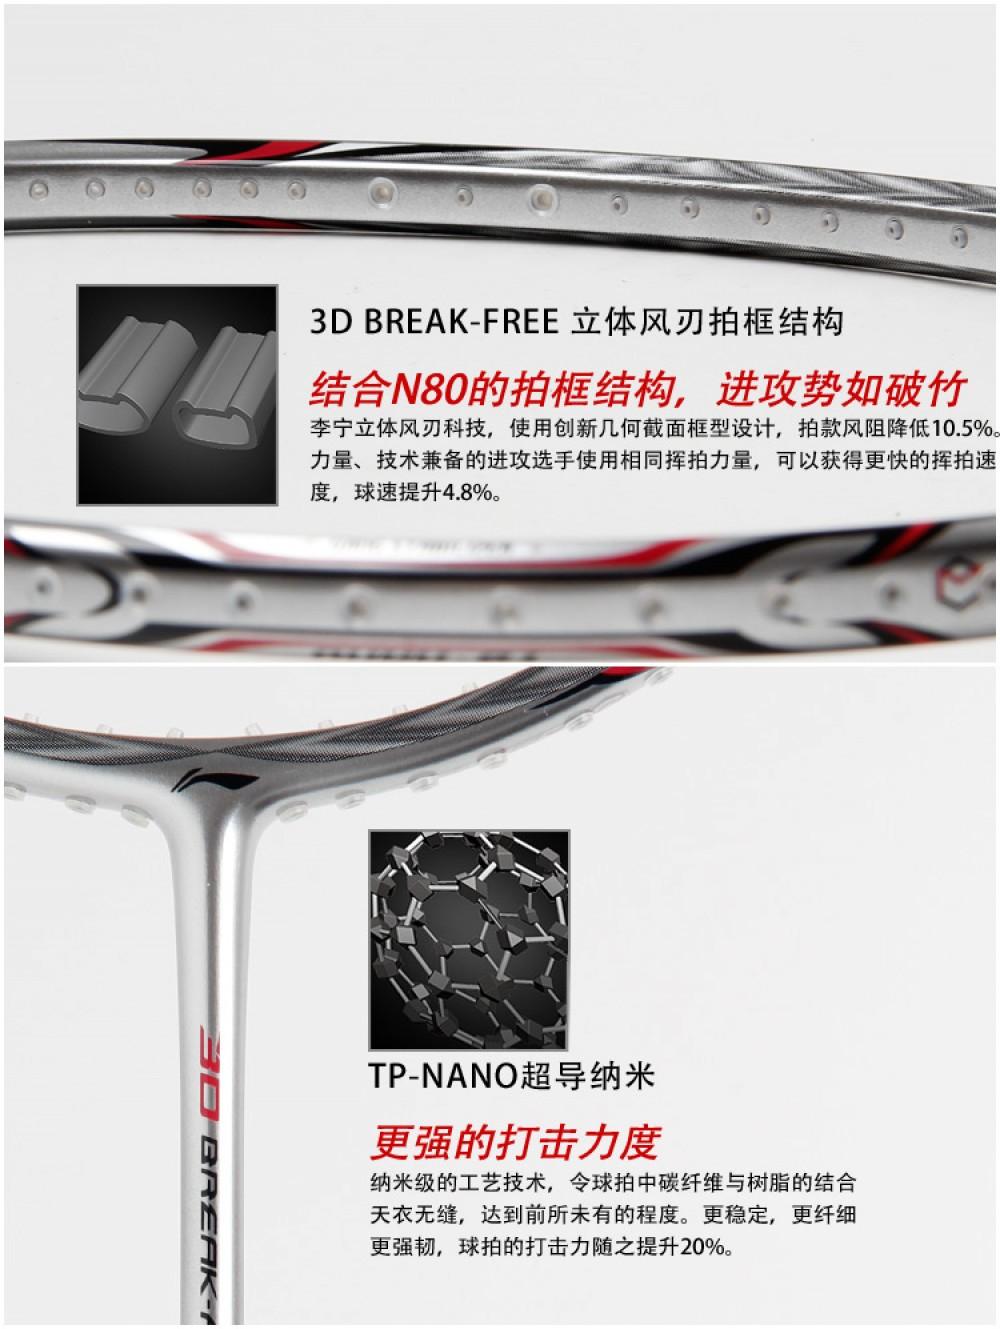 Li-Ning 80TD 3D Breakfree Badminton Racket